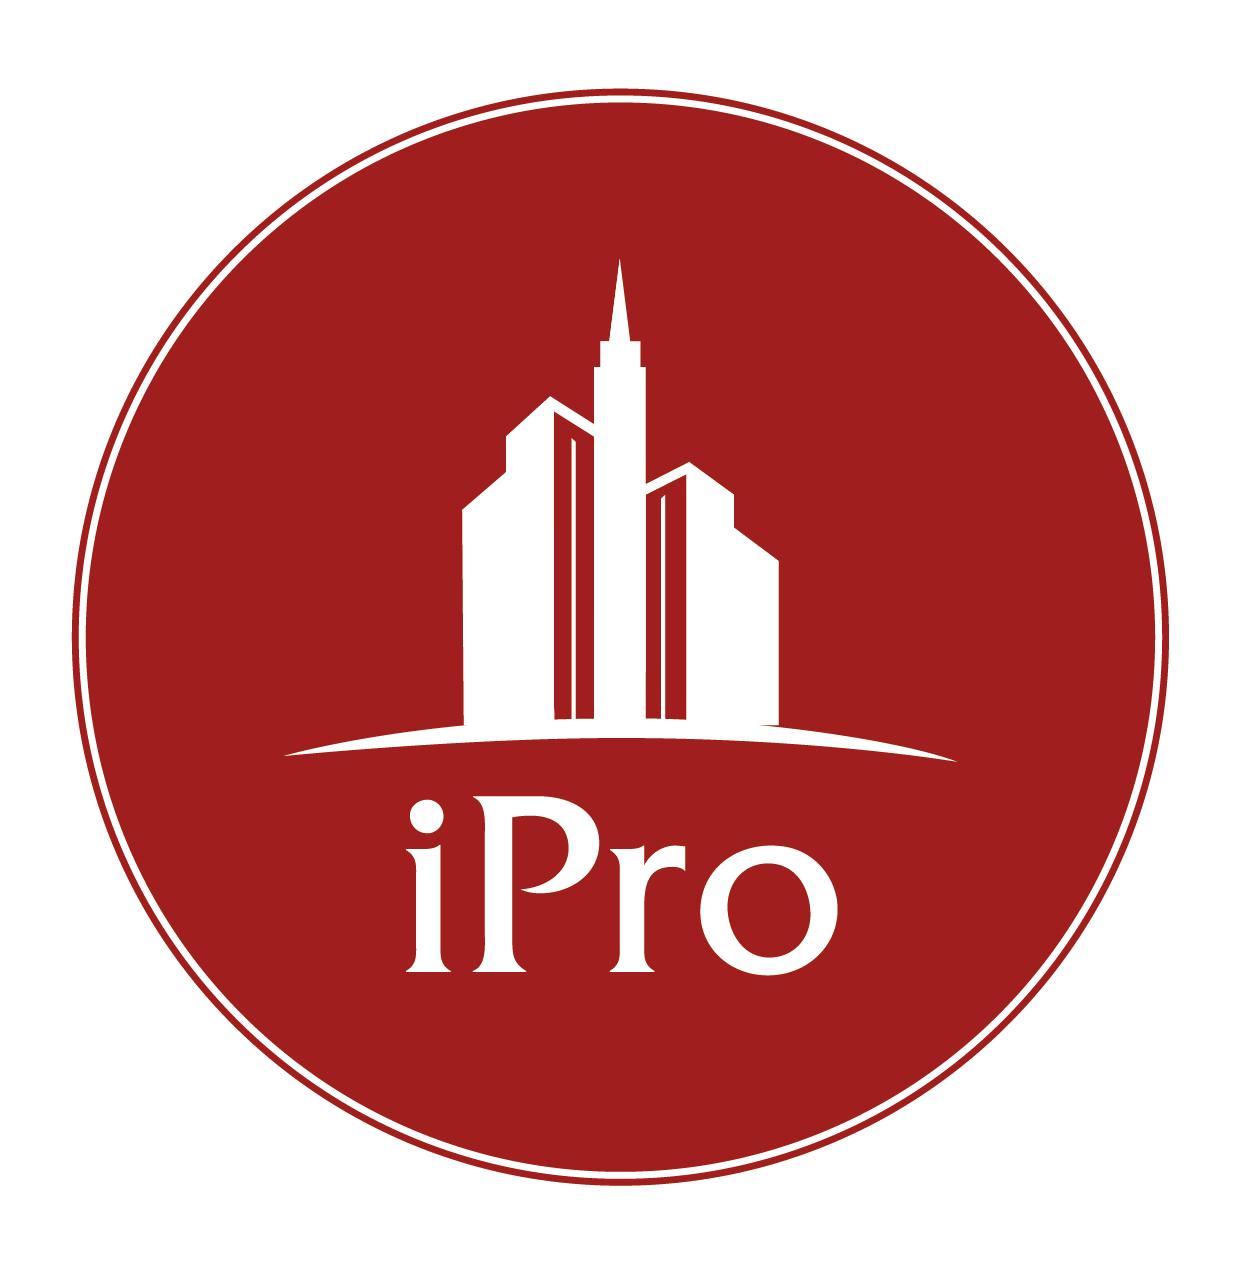 iPro agence immobilière Cuges-les-Pins (13780)